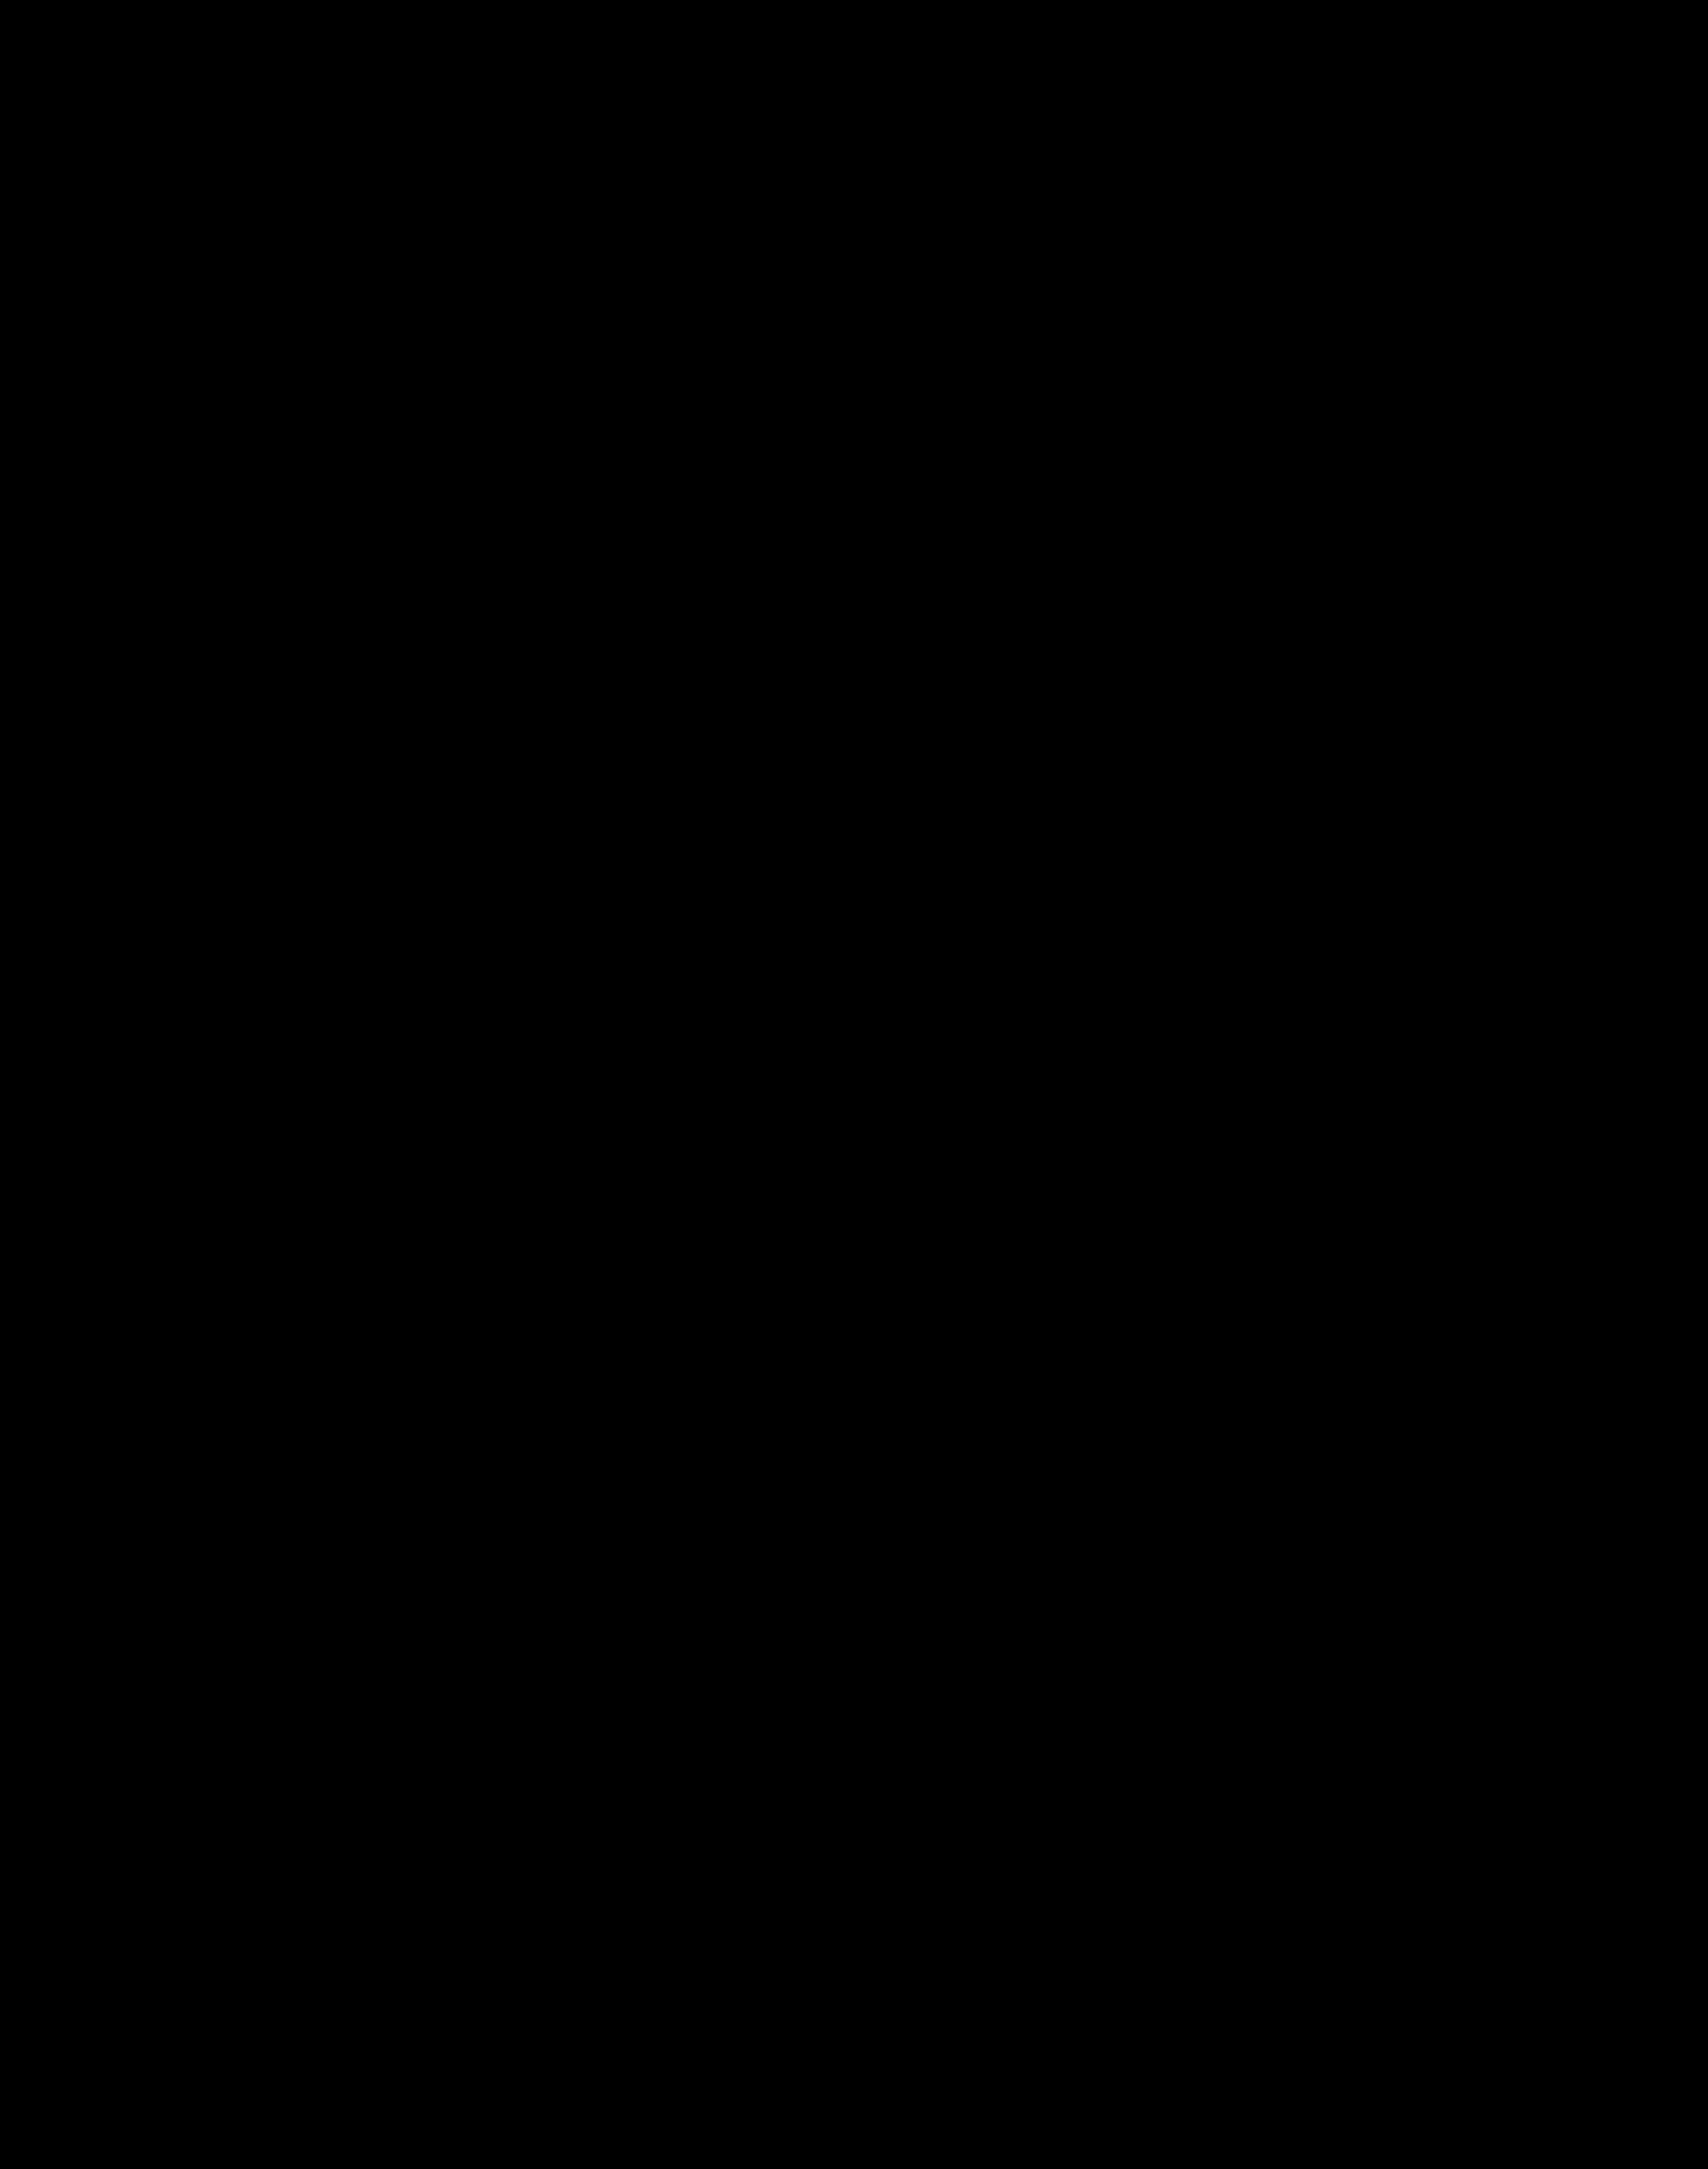 Hands tree big image. Marijuana clipart silhouette